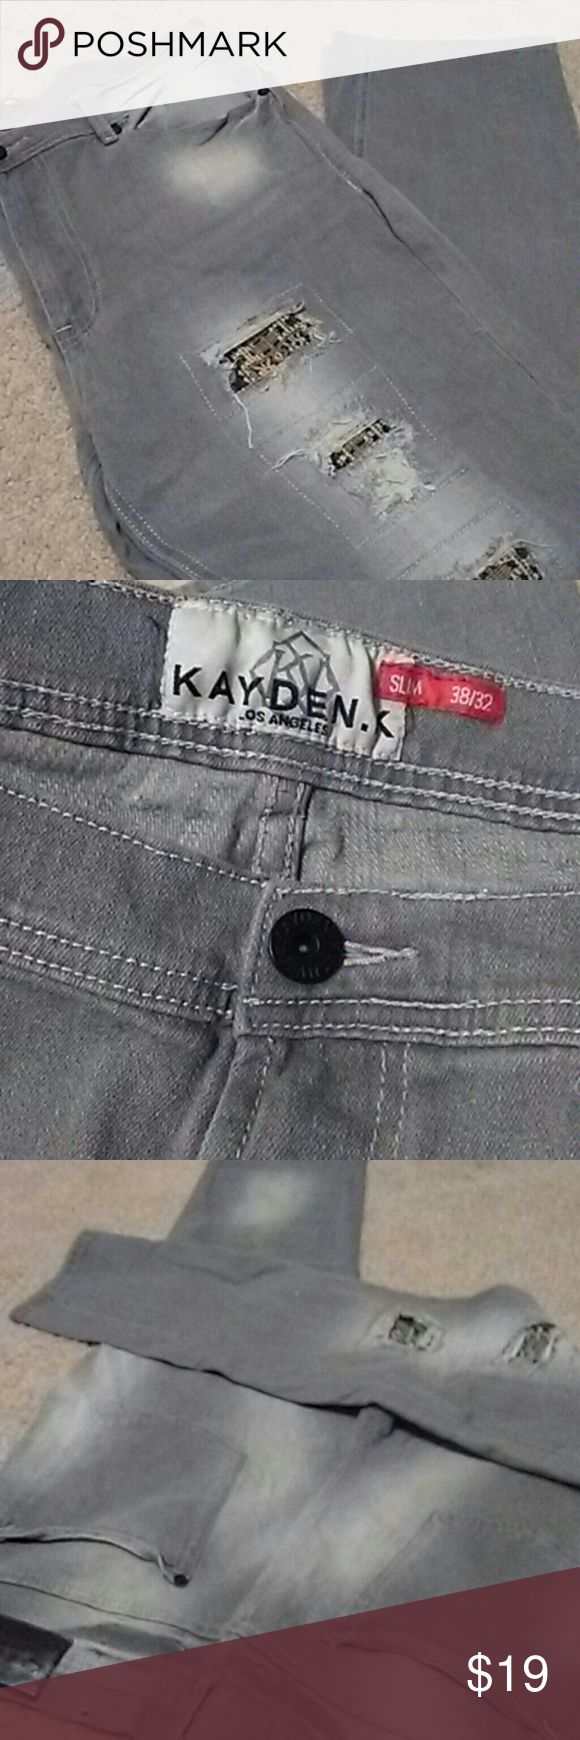 Kayden k mens slim jeans Mens light grey slim 38/32 Kayden K jeans Ripped/ Distressed with fabric patchwork Kayden K Jeans Slim